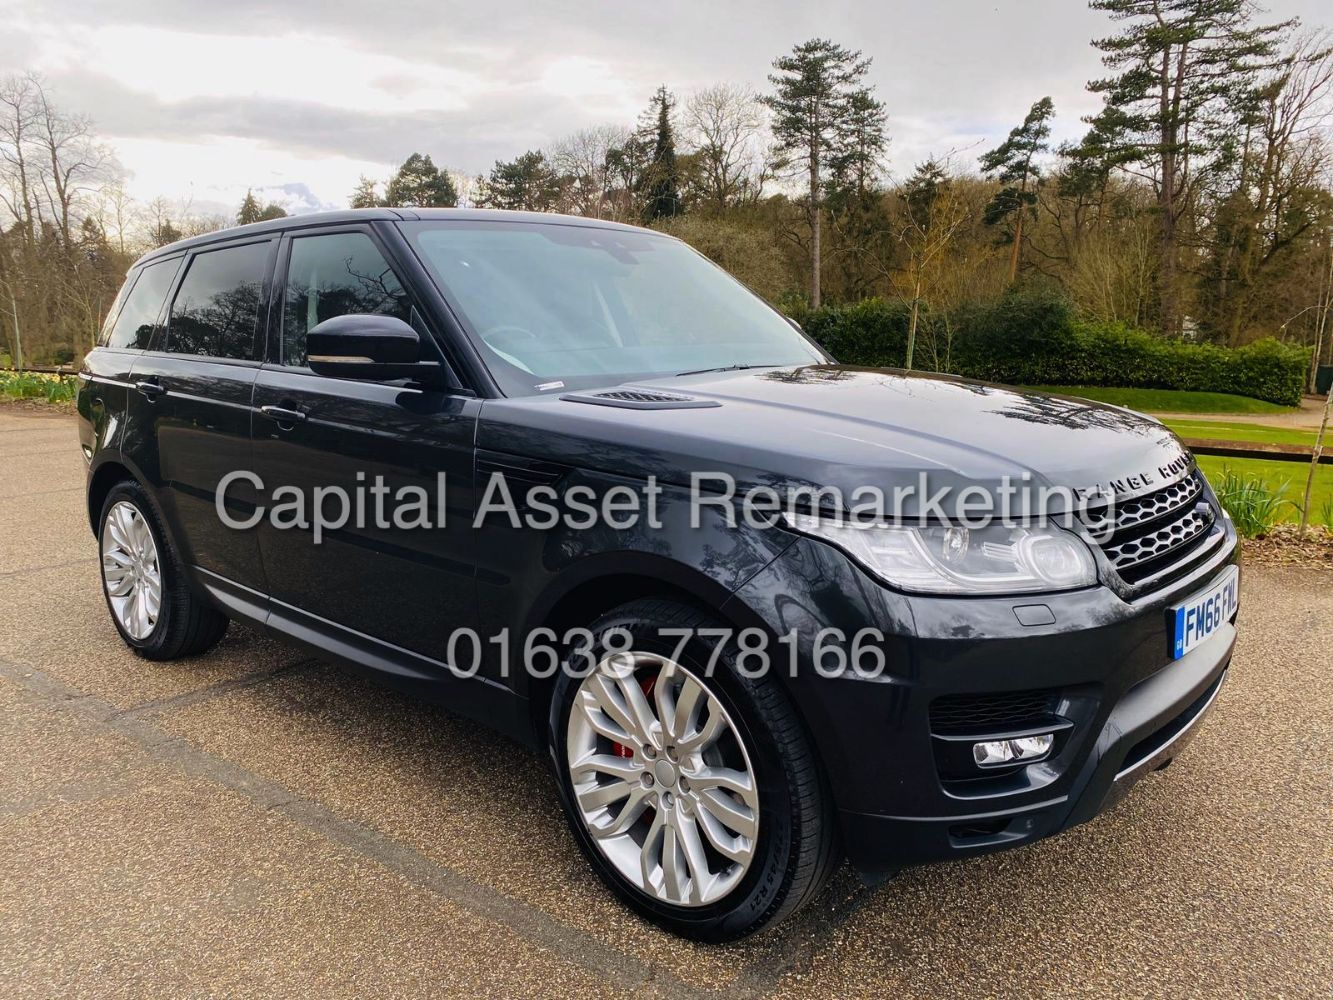 2017 Range Rover Sport 3.0 SDV6 *HSE Dynamic* - 2018 Vw Caddy (Euro 6) - 2017 Mercedes-Benz Sprinter 314 Cdi *4.7 XLWB - Euro 6* + Many More...